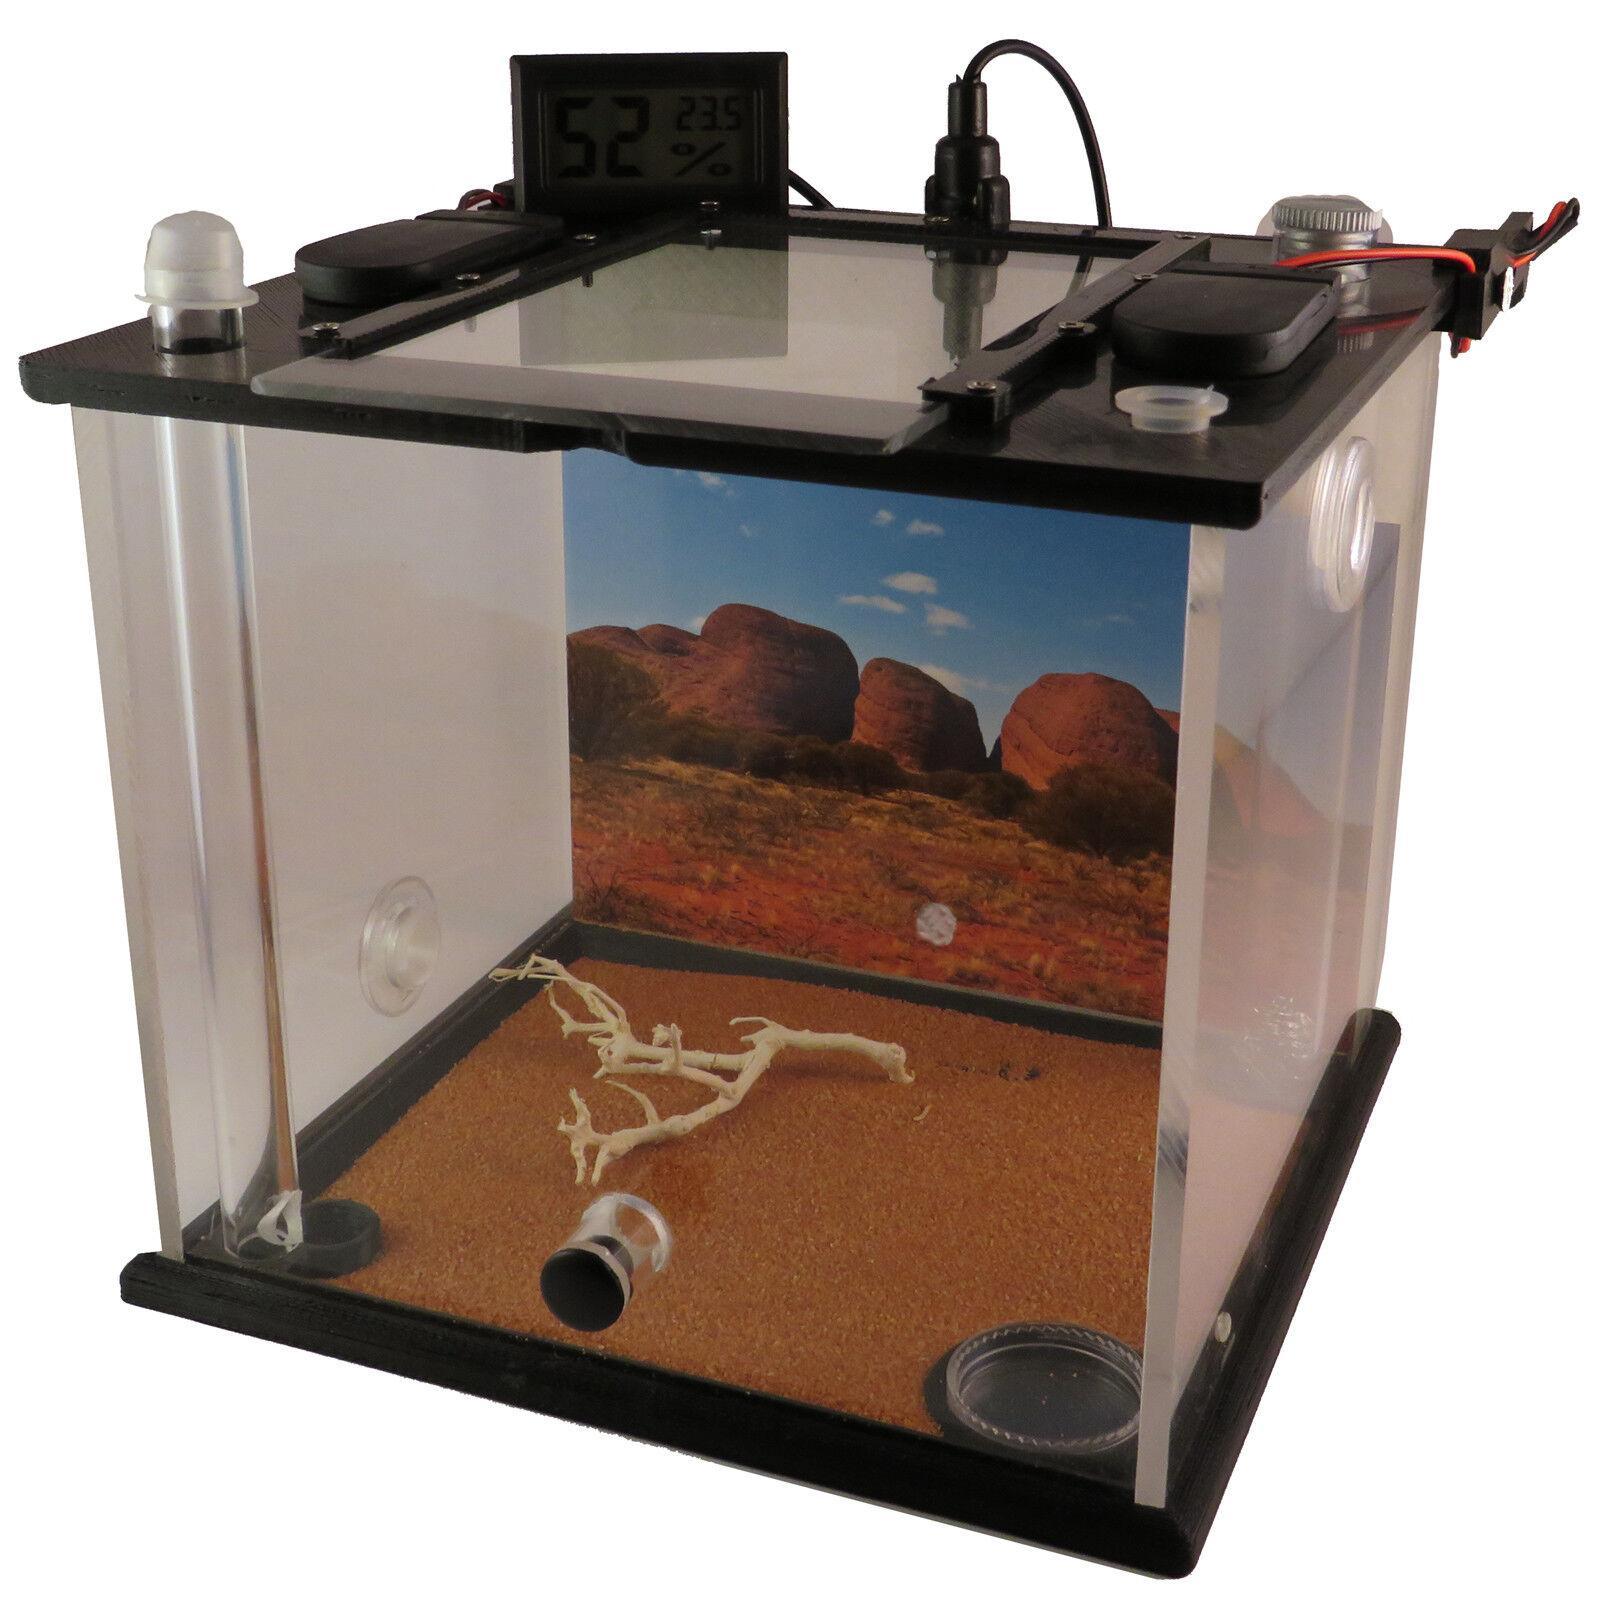 ANT Farm   Starter Kit, formicarium, terrario, Formica Cube, mediumdesert, Regalo